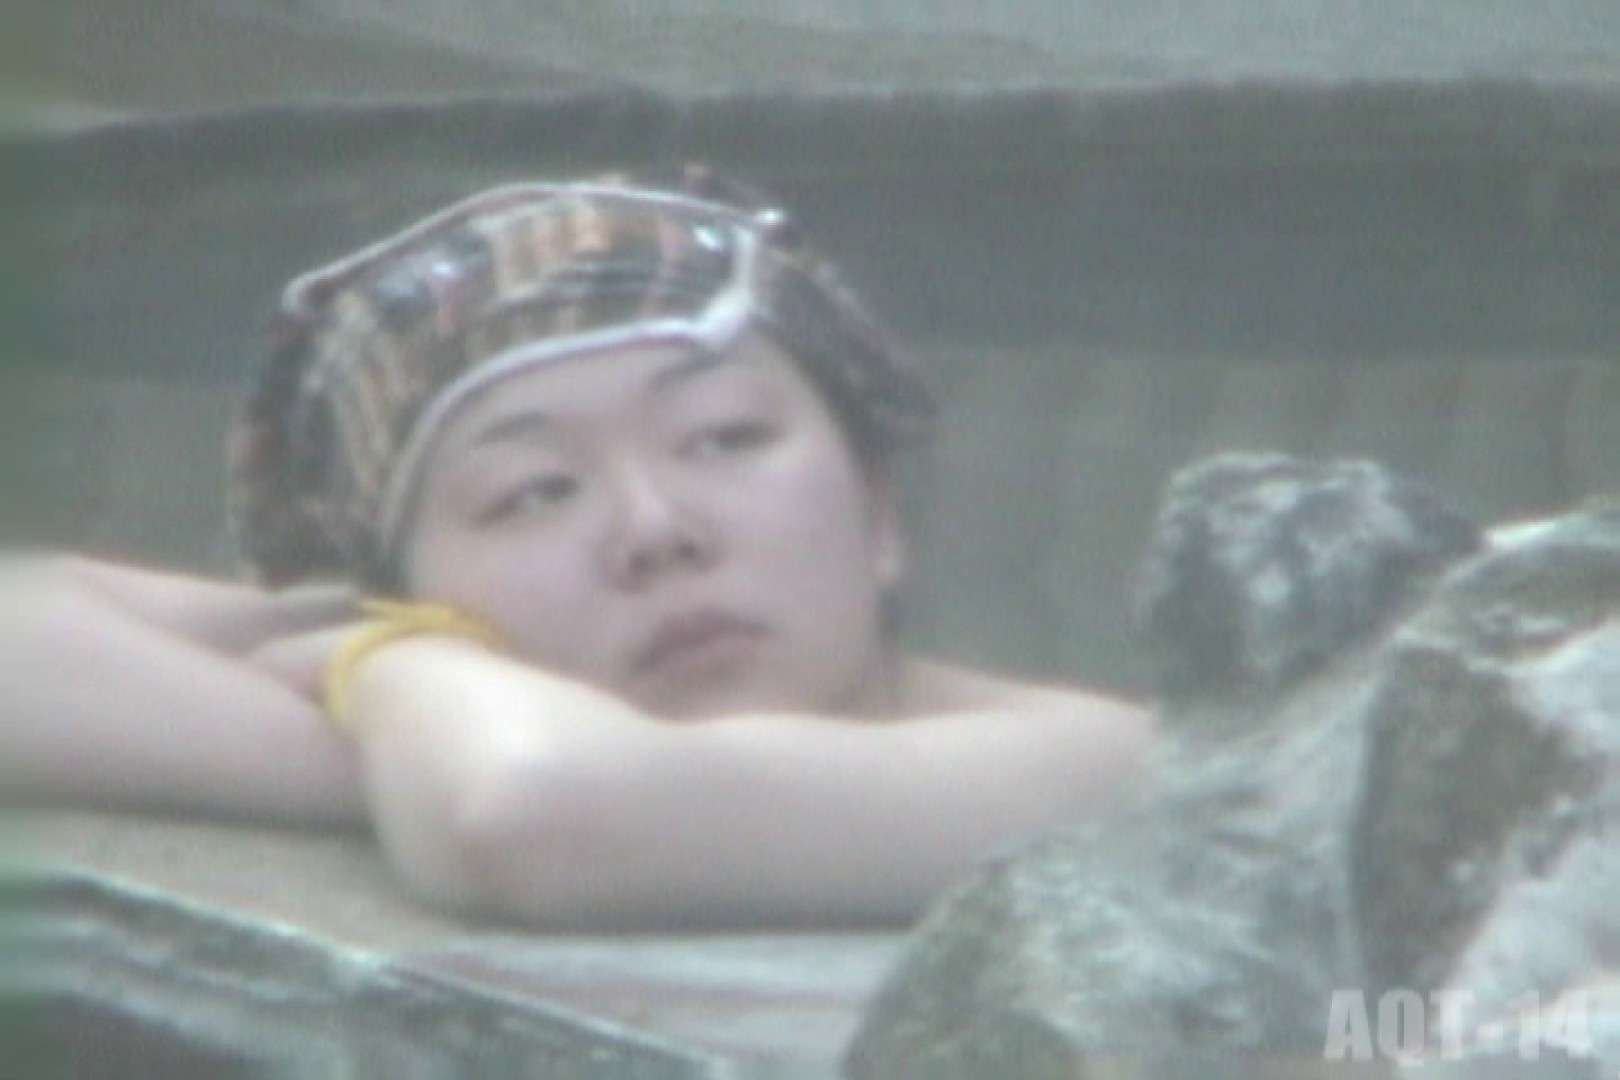 Aquaな露天風呂Vol.830 露天   HなOL  101pic 2